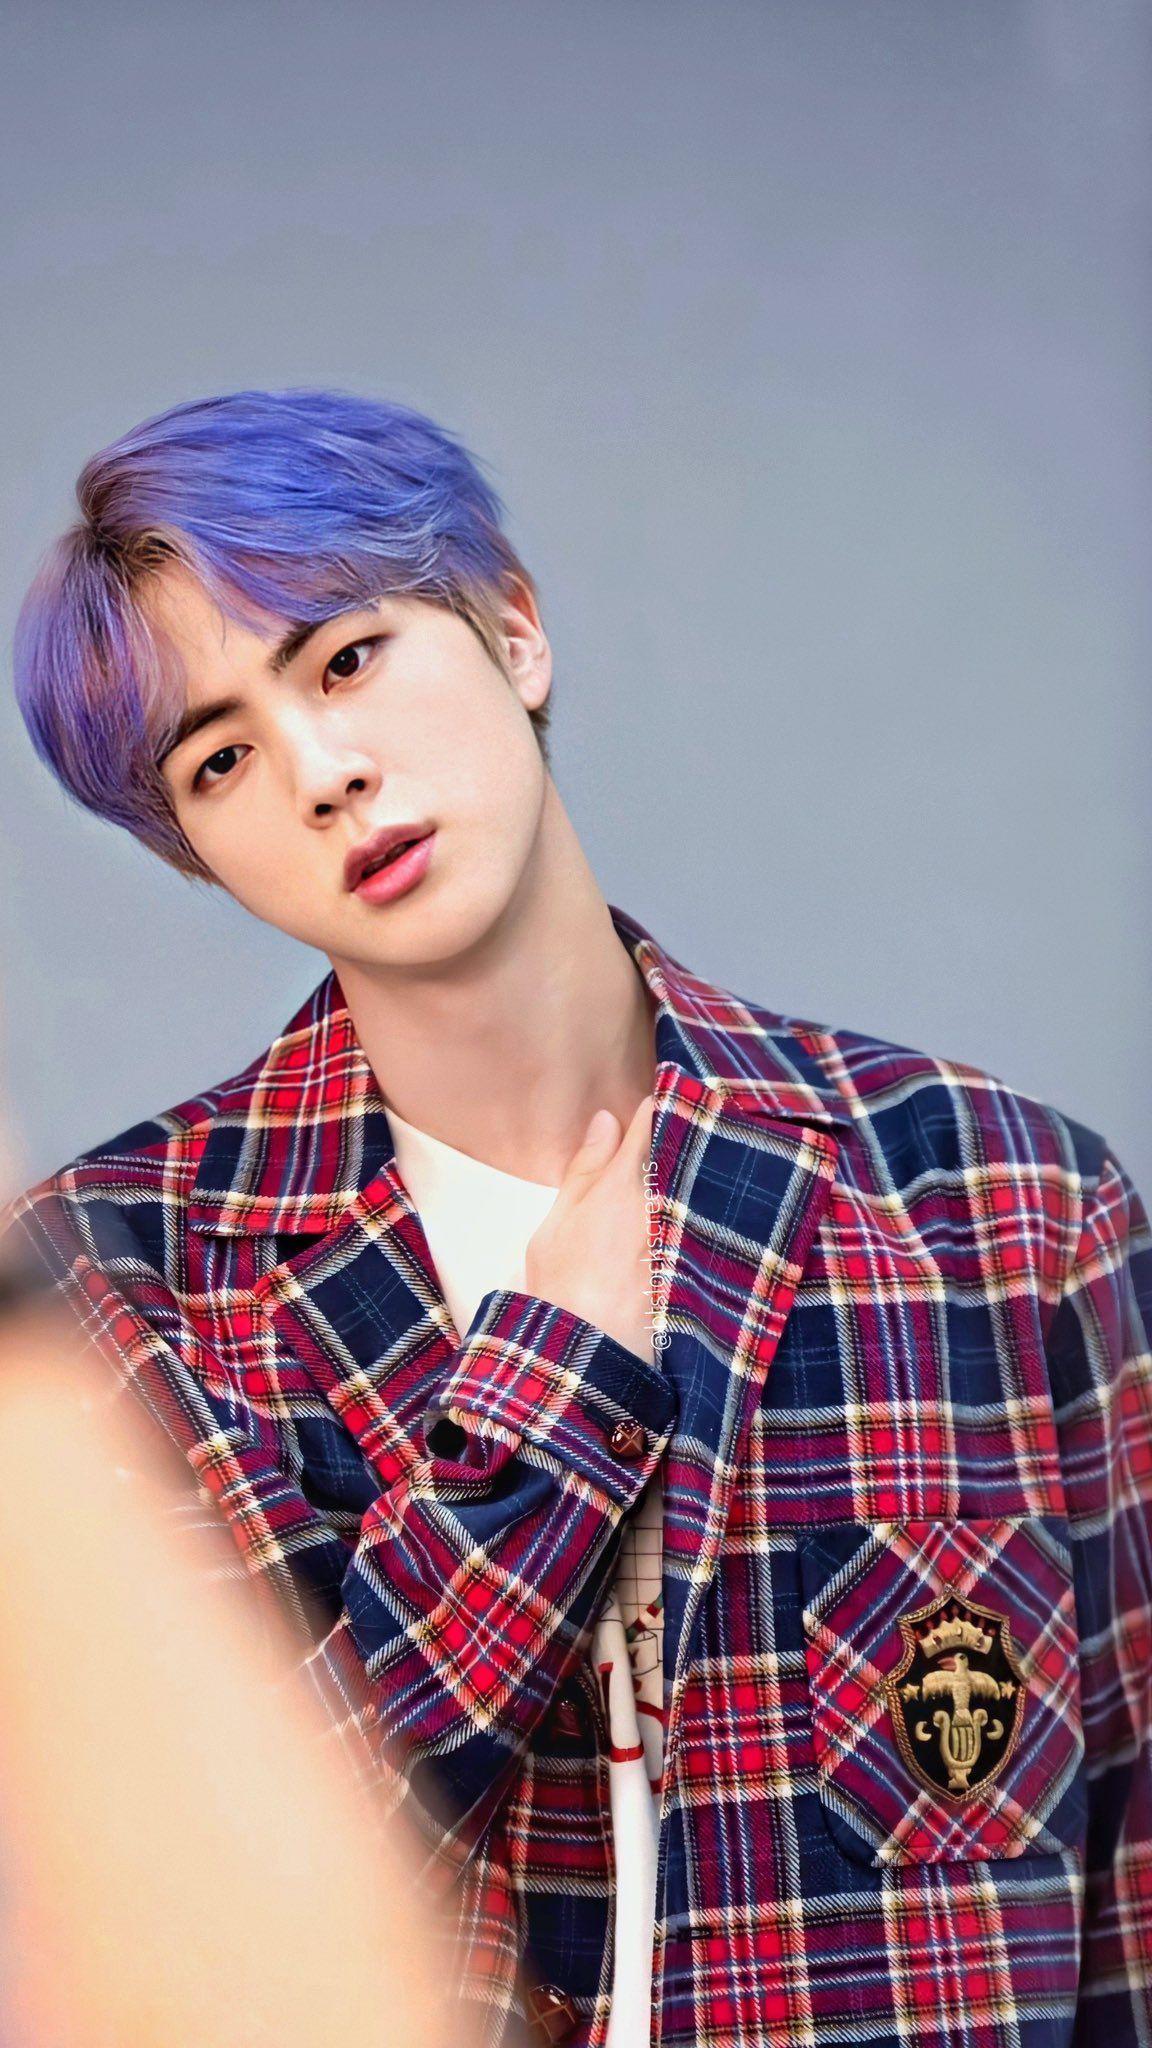 Kpop Bts Bangtan Bangtansonyeondan Kimseokjin Seokjin Jin Em 2020 Jungkook Meme Imagens Bts Seokjin